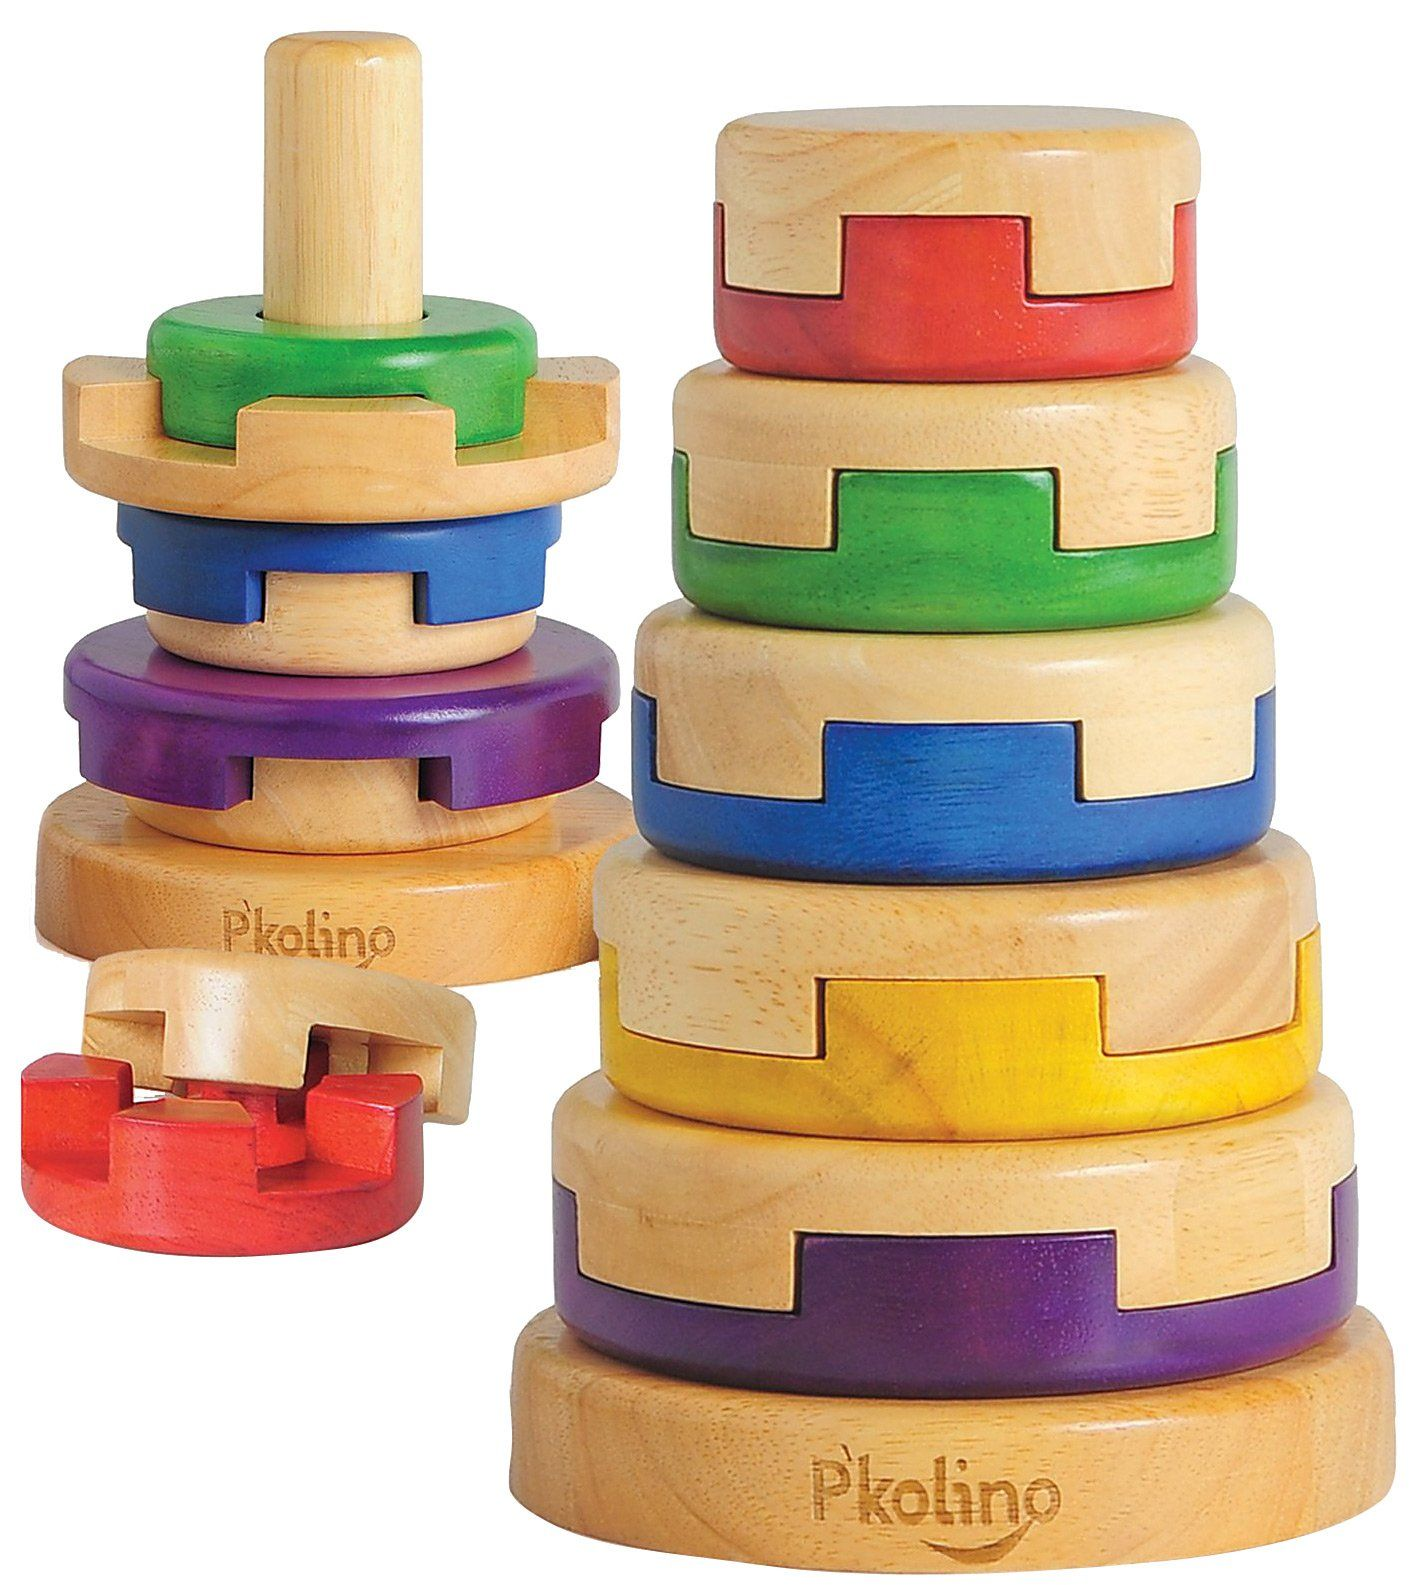 P kolino Puzzle Stacker Free Shipping